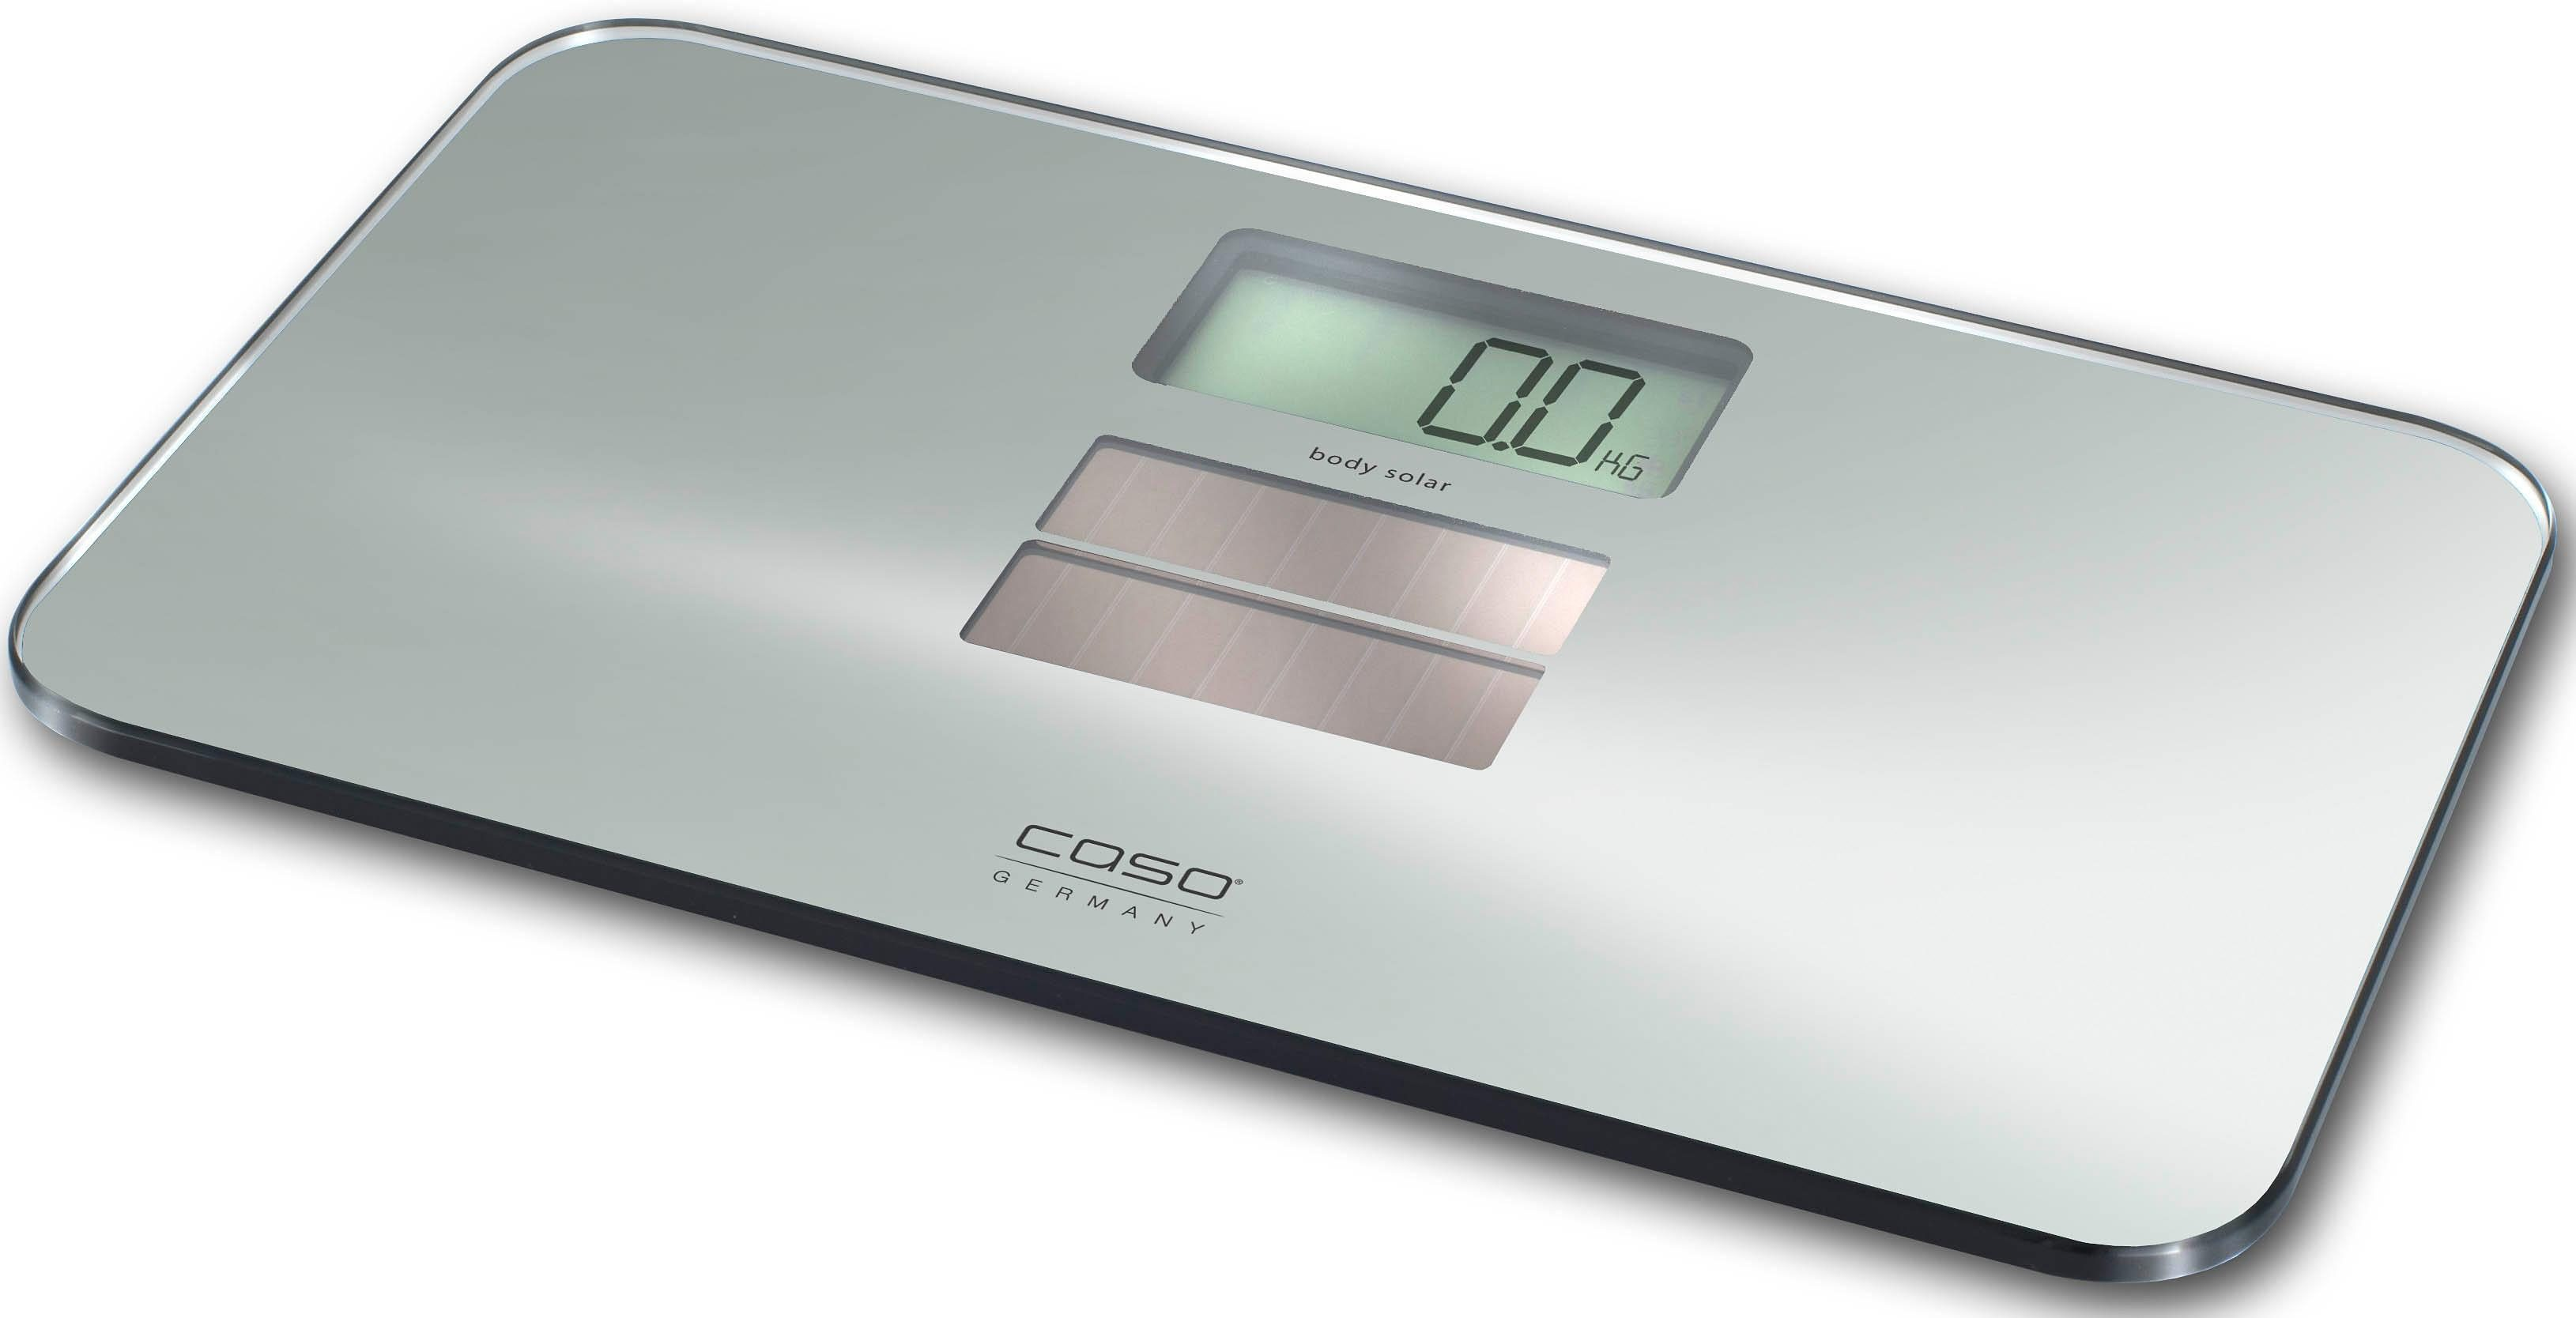 caso Germany Personenwaage CASO Body Solar, mit Solarzellenakku